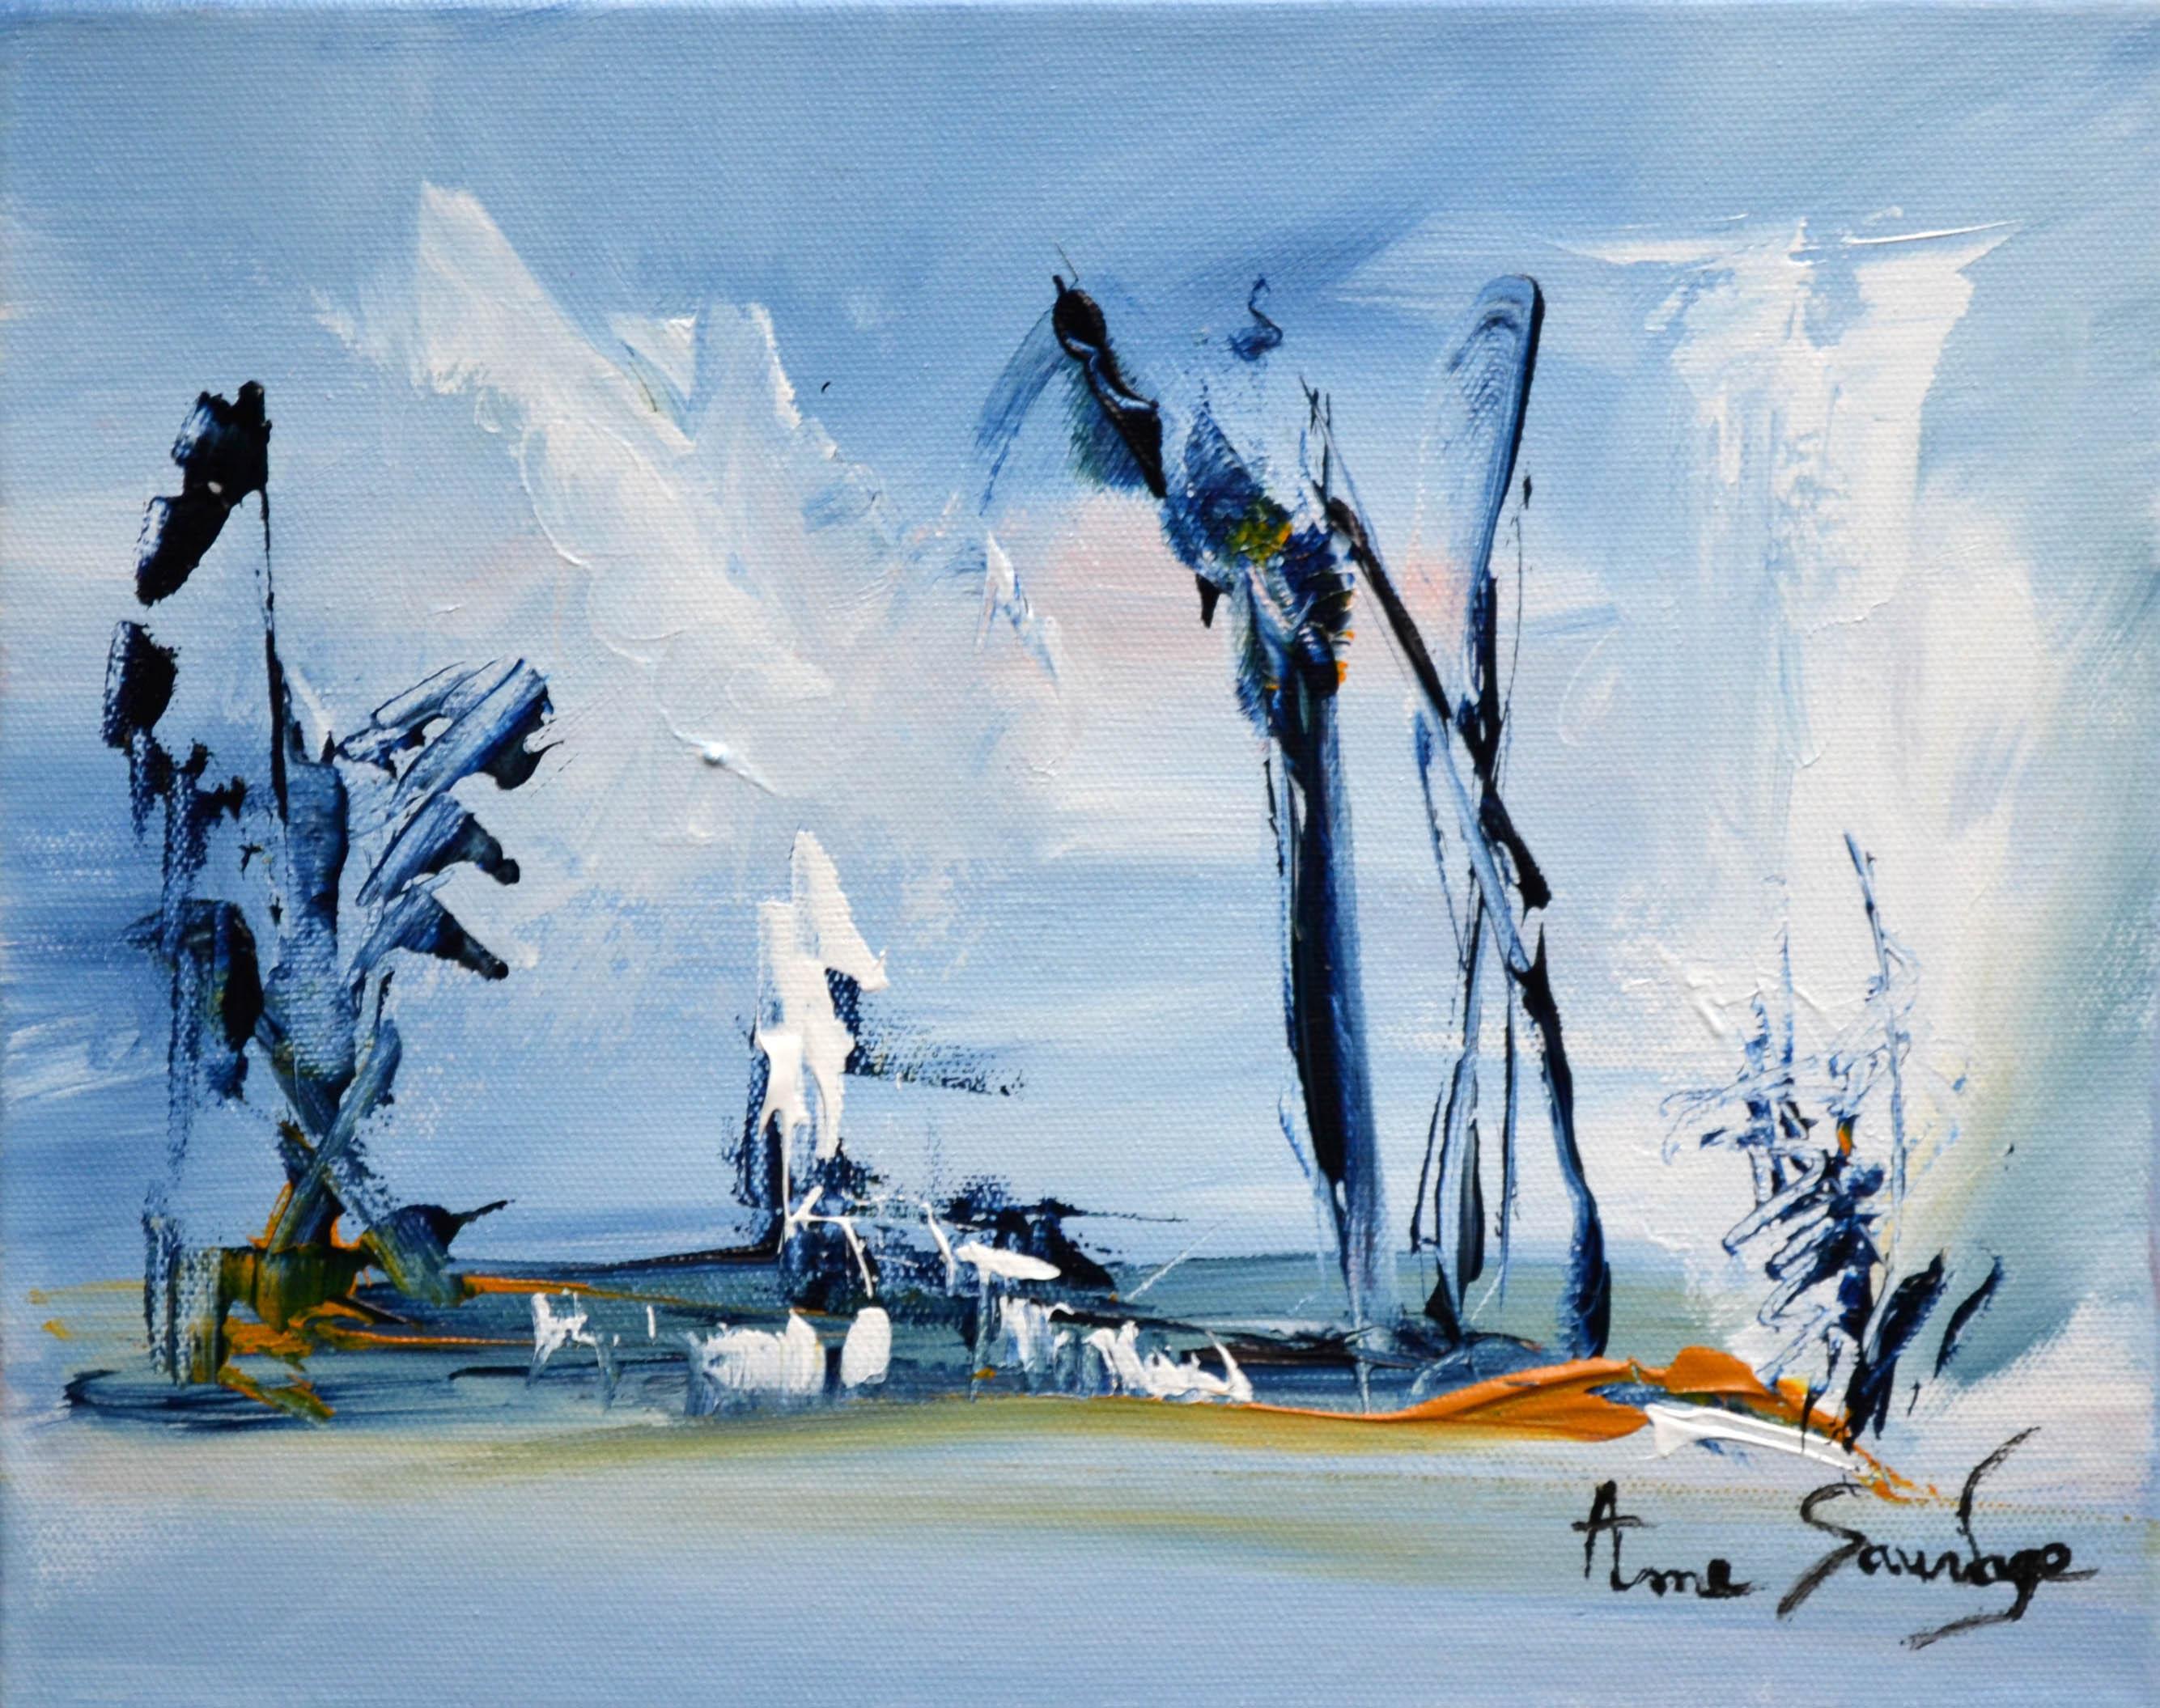 tableau bleu abstrait paysage hiver peintre abstrait ame sauvage. Black Bedroom Furniture Sets. Home Design Ideas